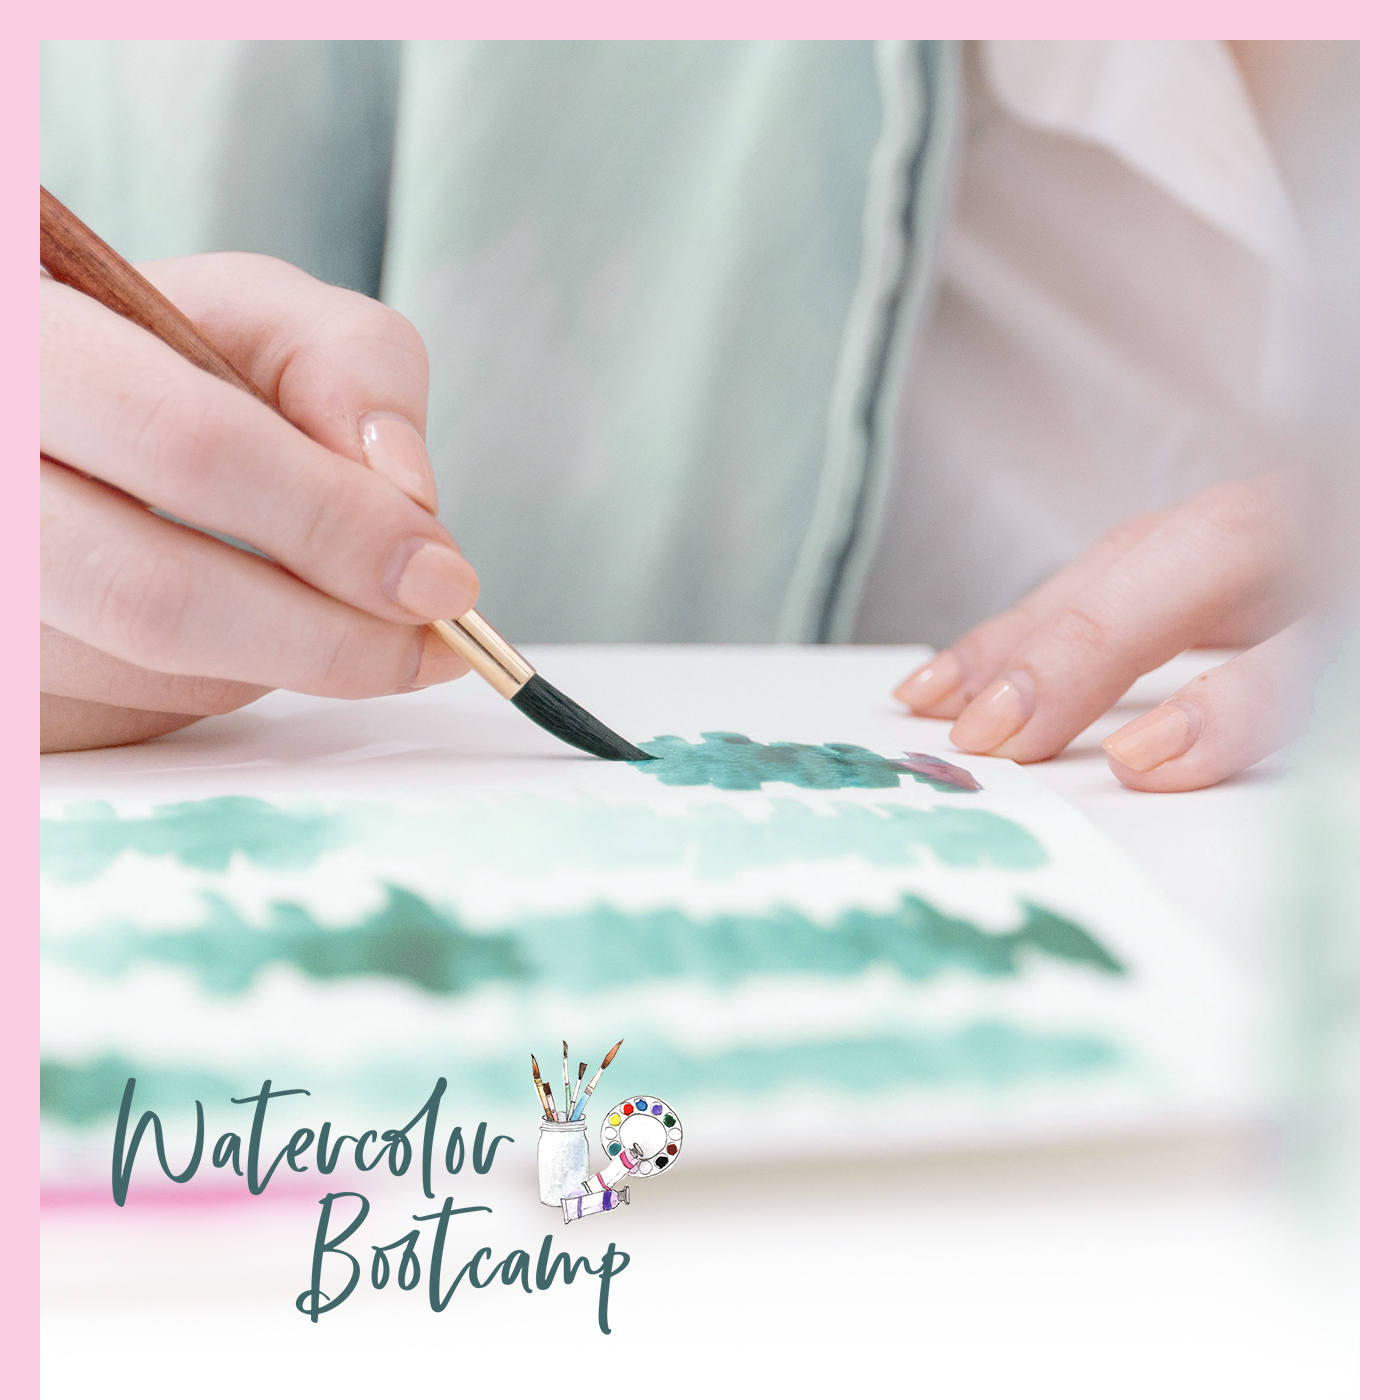 watercolor bootcamp -